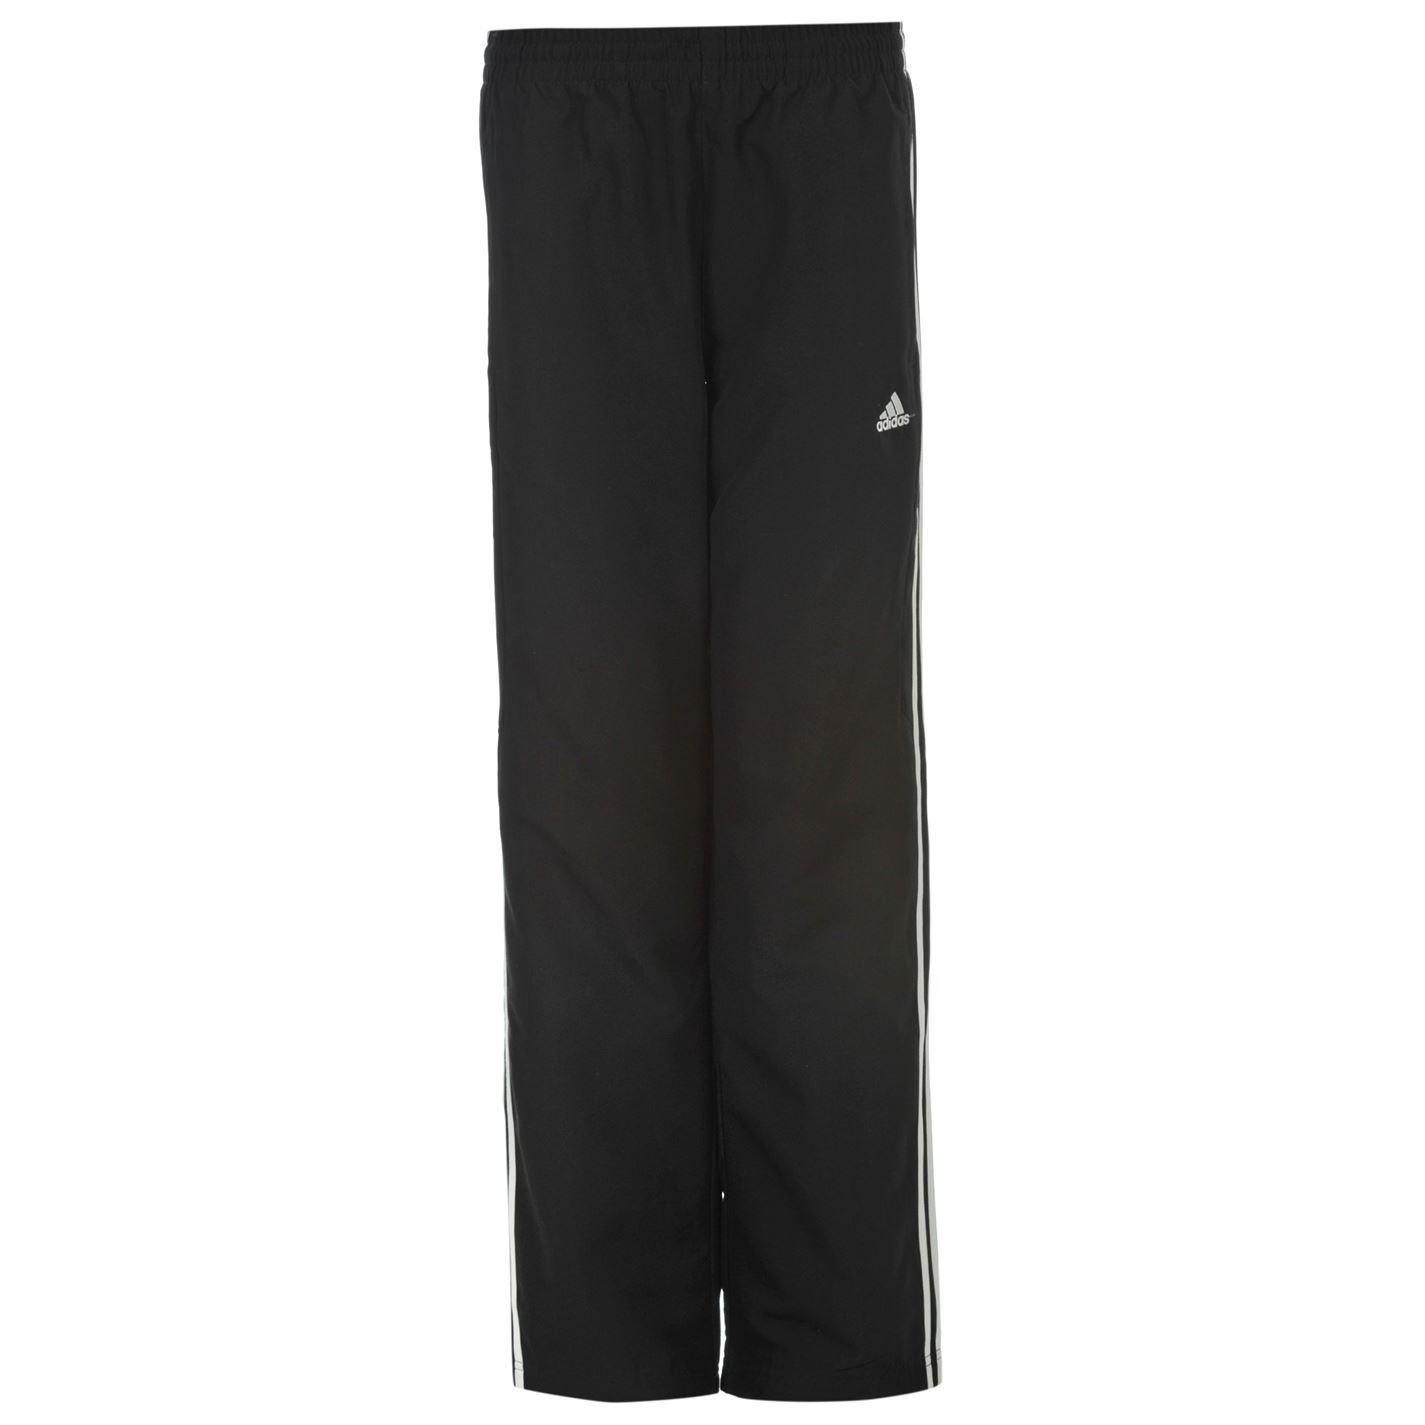 Pantalon de jogging adidas Samson 2 Junior Doublure en mesh Casual Garçons Enfants